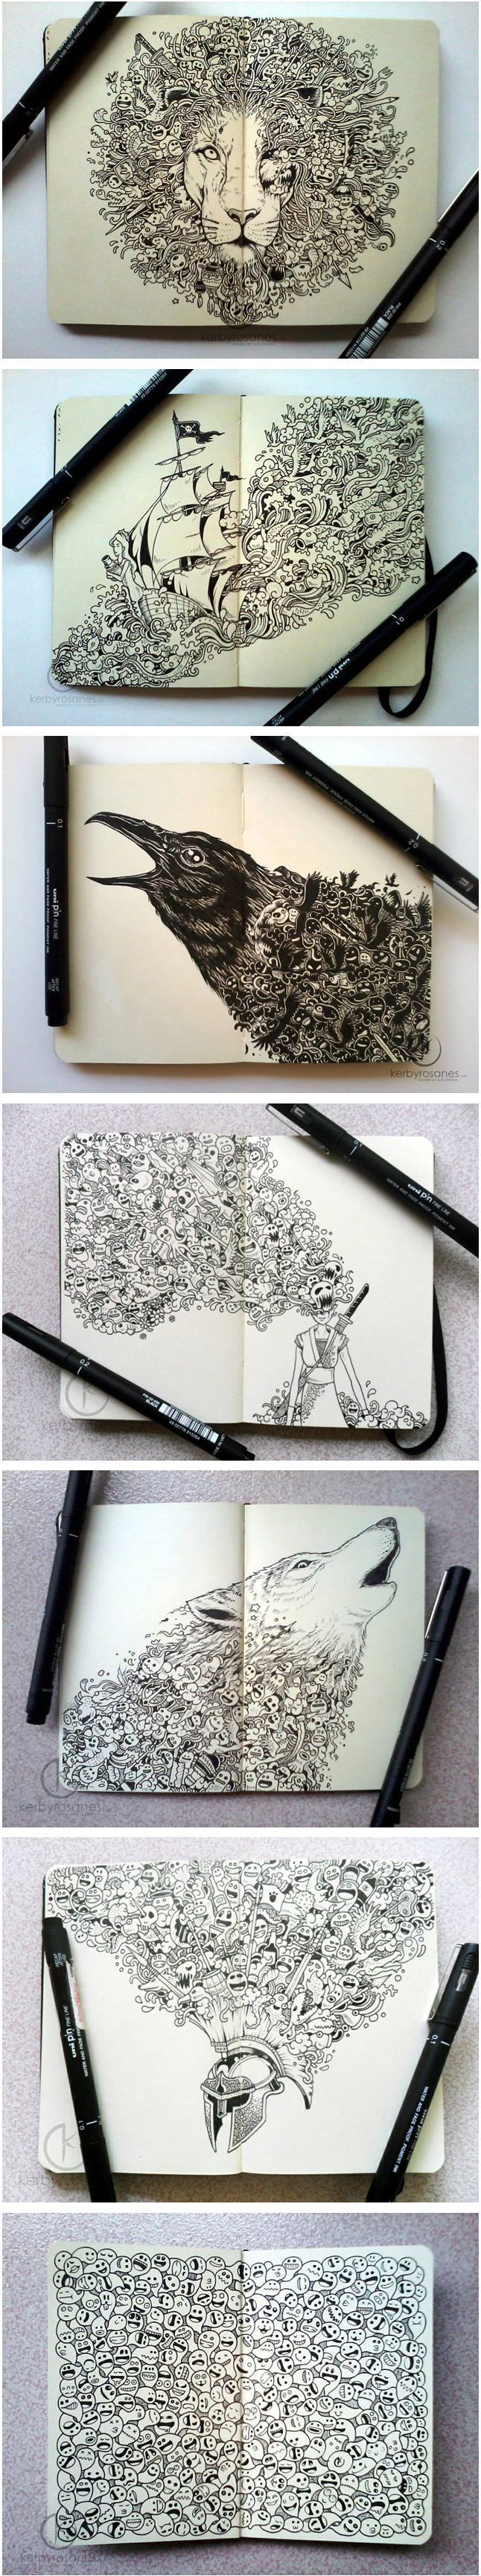 Moleskine Doodles.